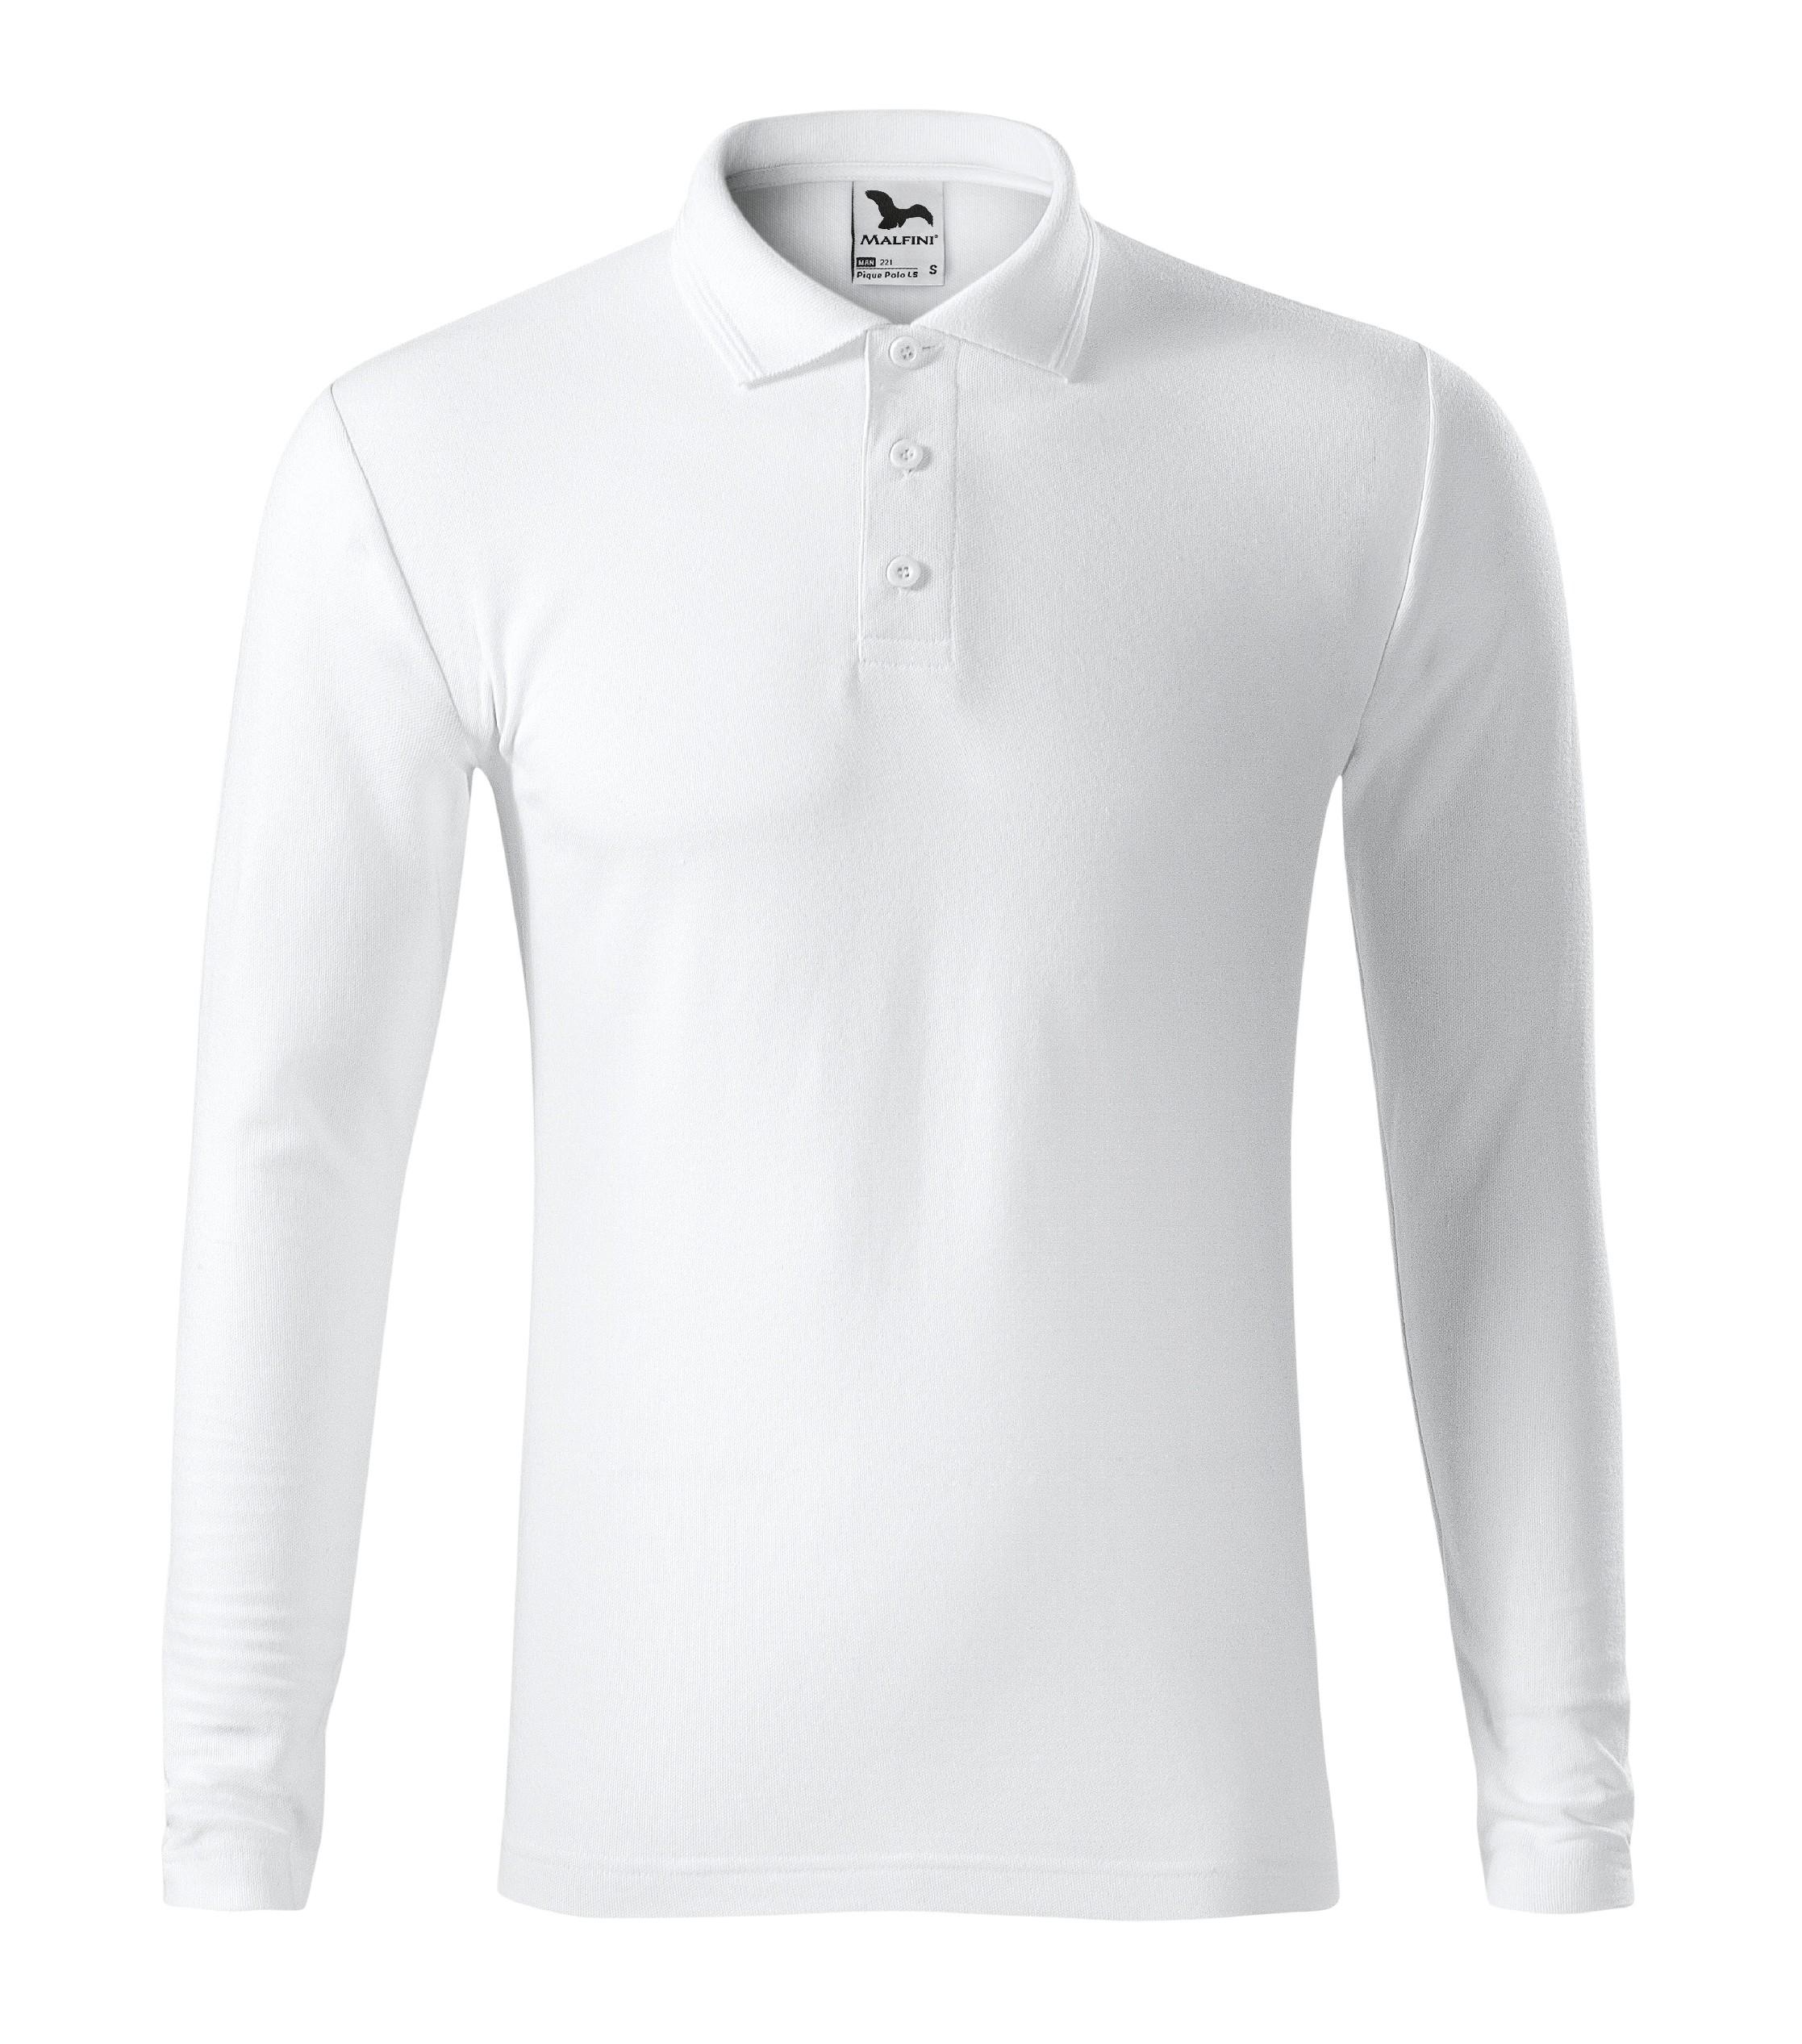 Polokošile pánská Pique Polo LS Barva: Bílá, Velikost: L